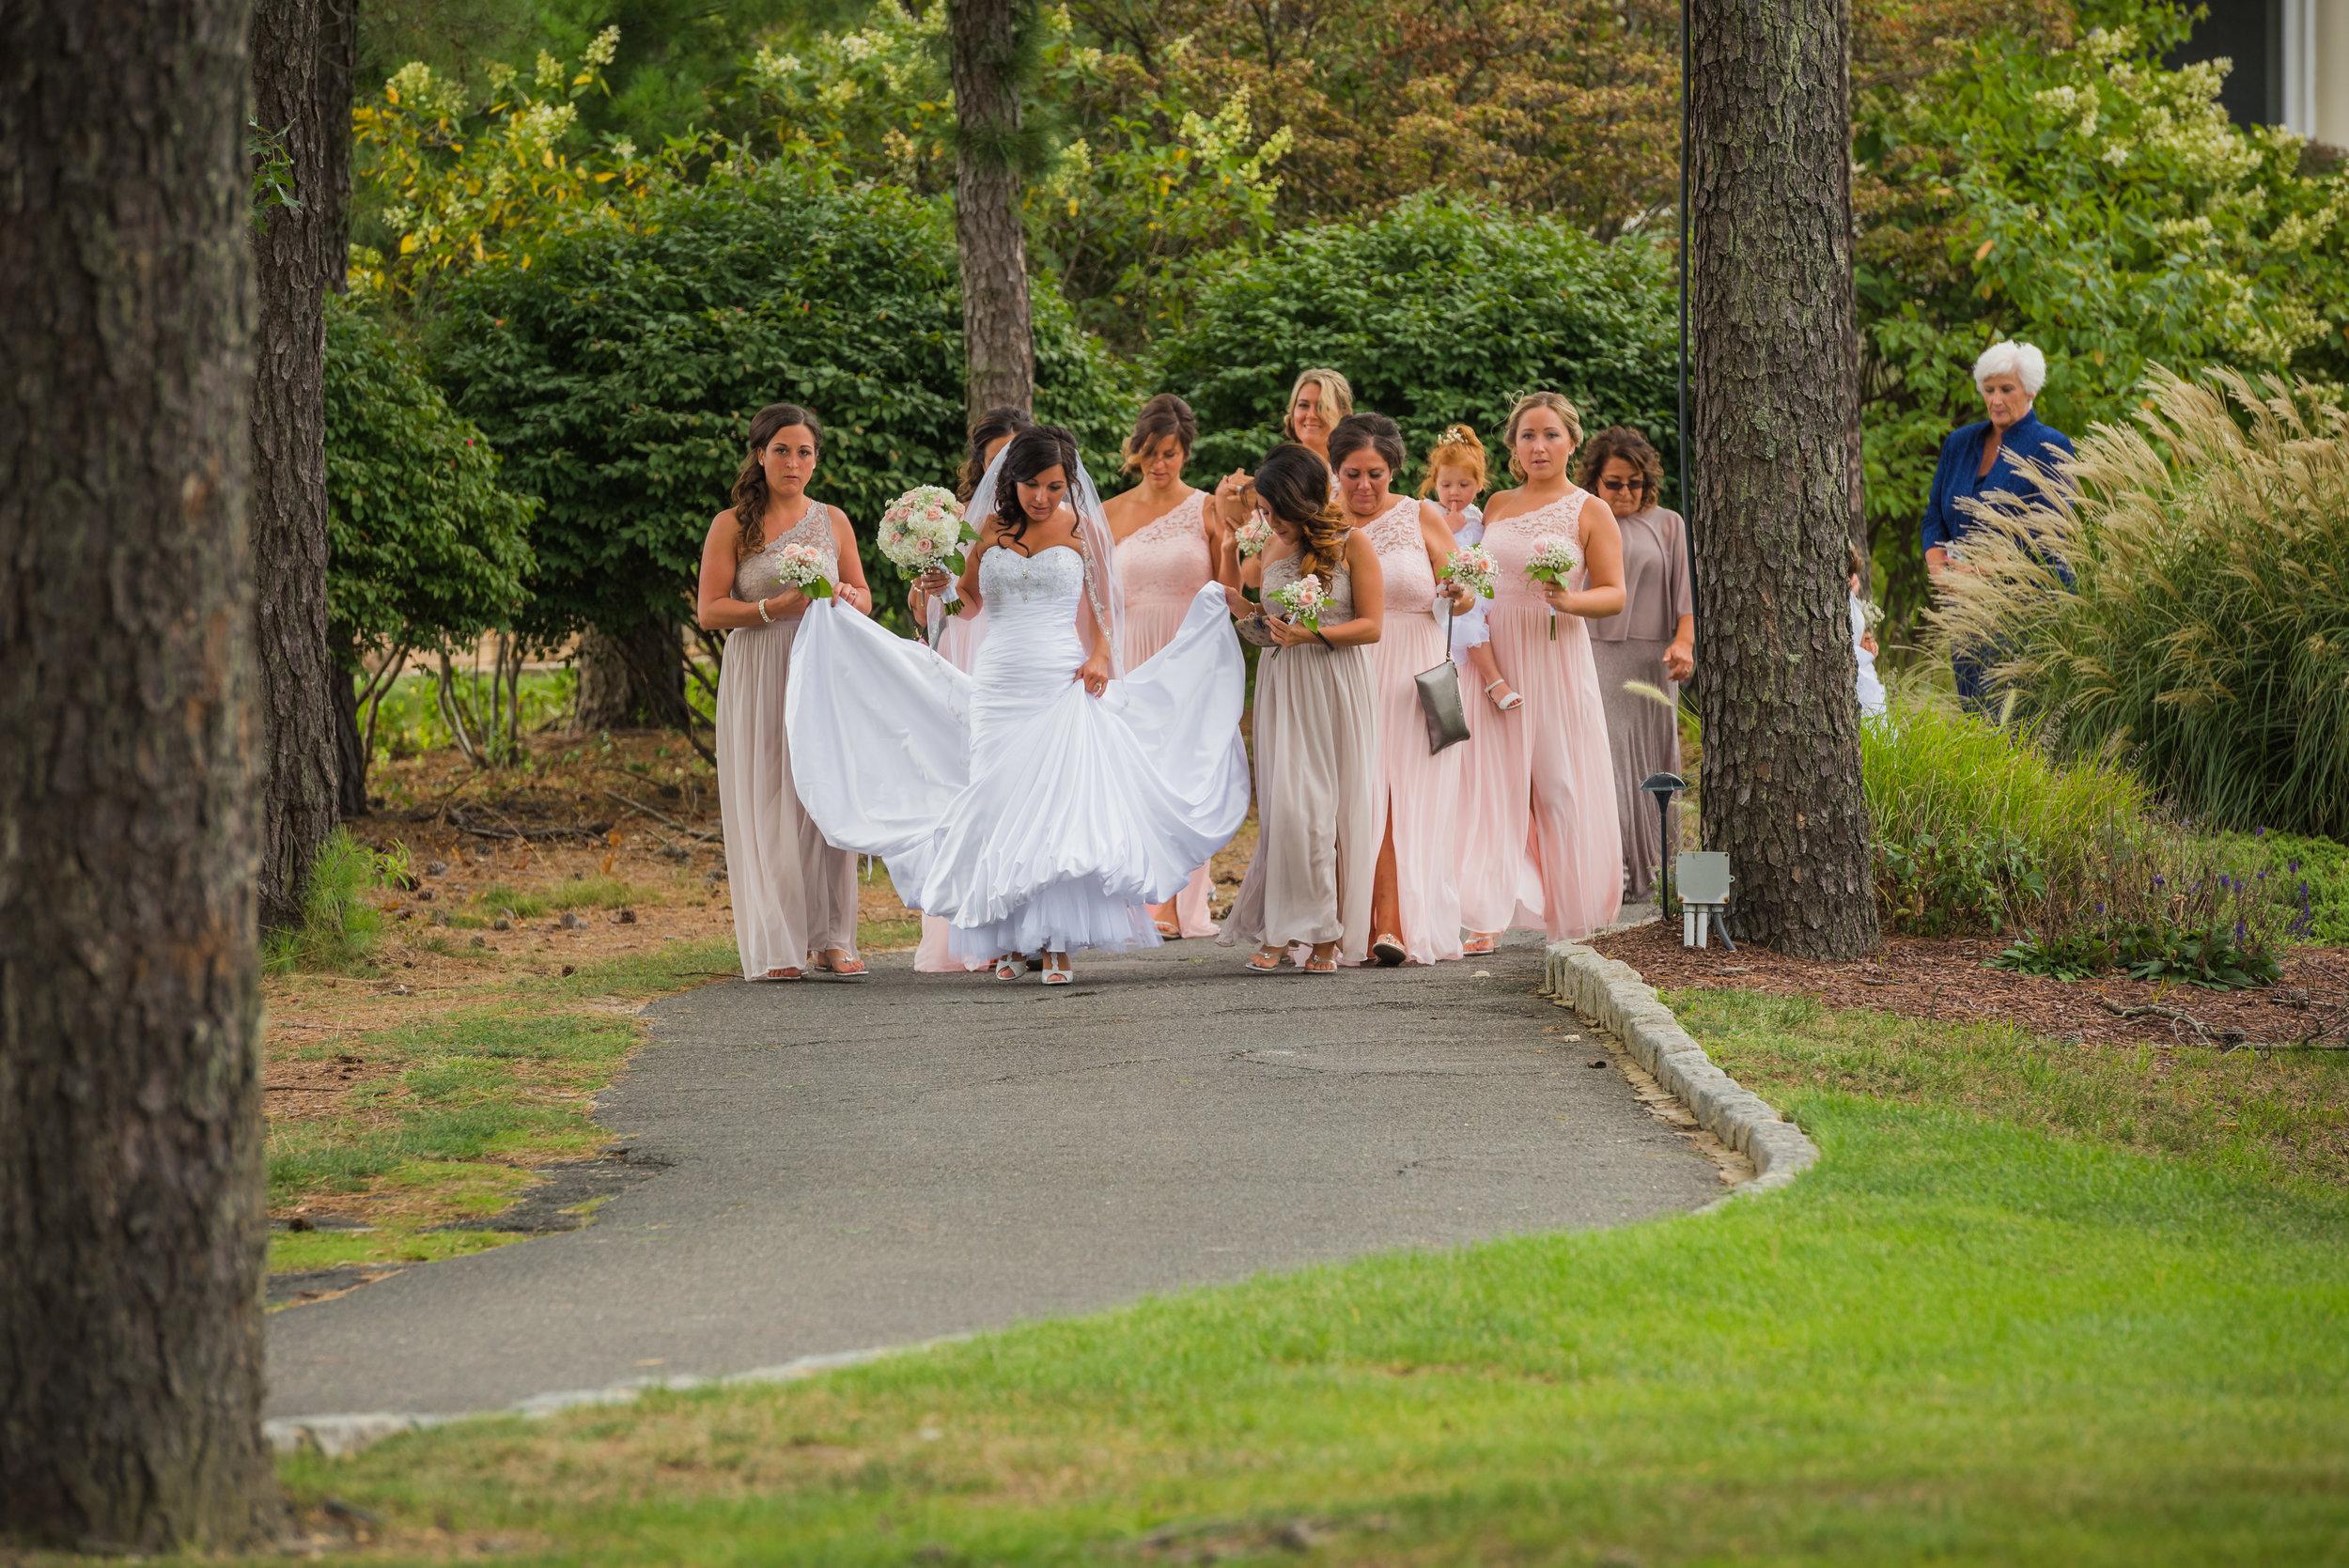 Seaoaks Wedding Photos Steph 13